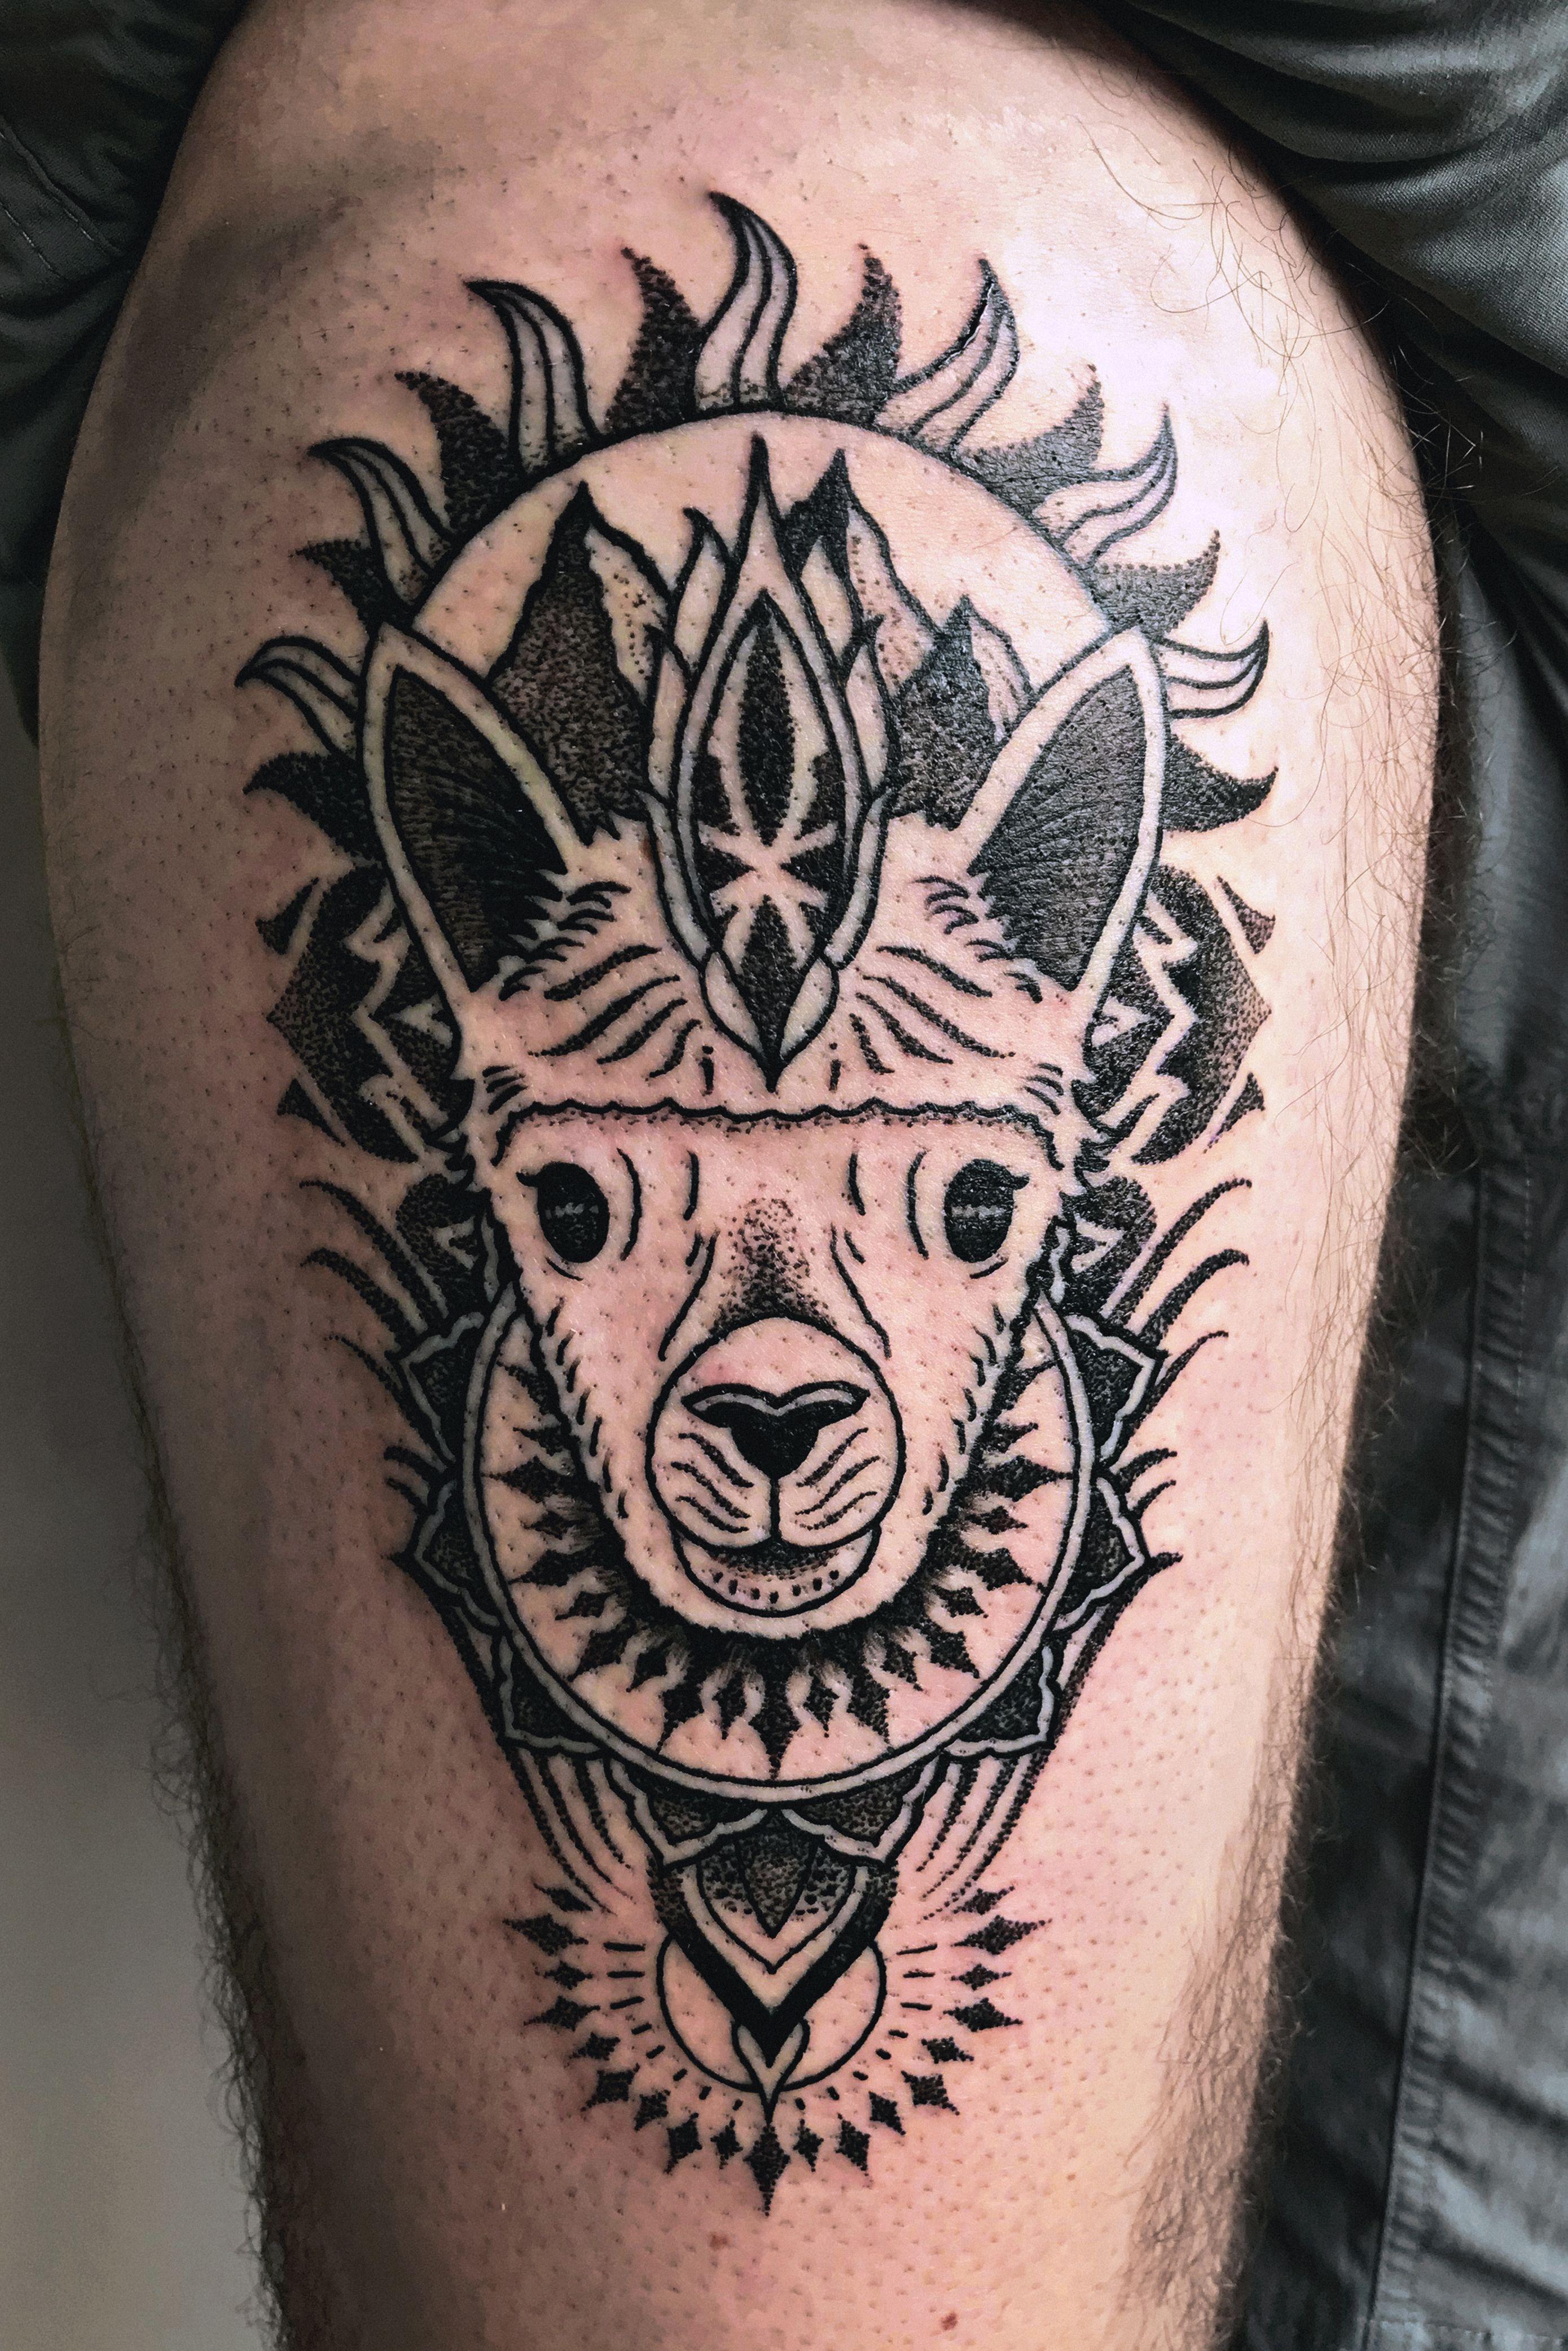 Cosmic alpaca tattoo made by zak korvin at pisac tattoo in